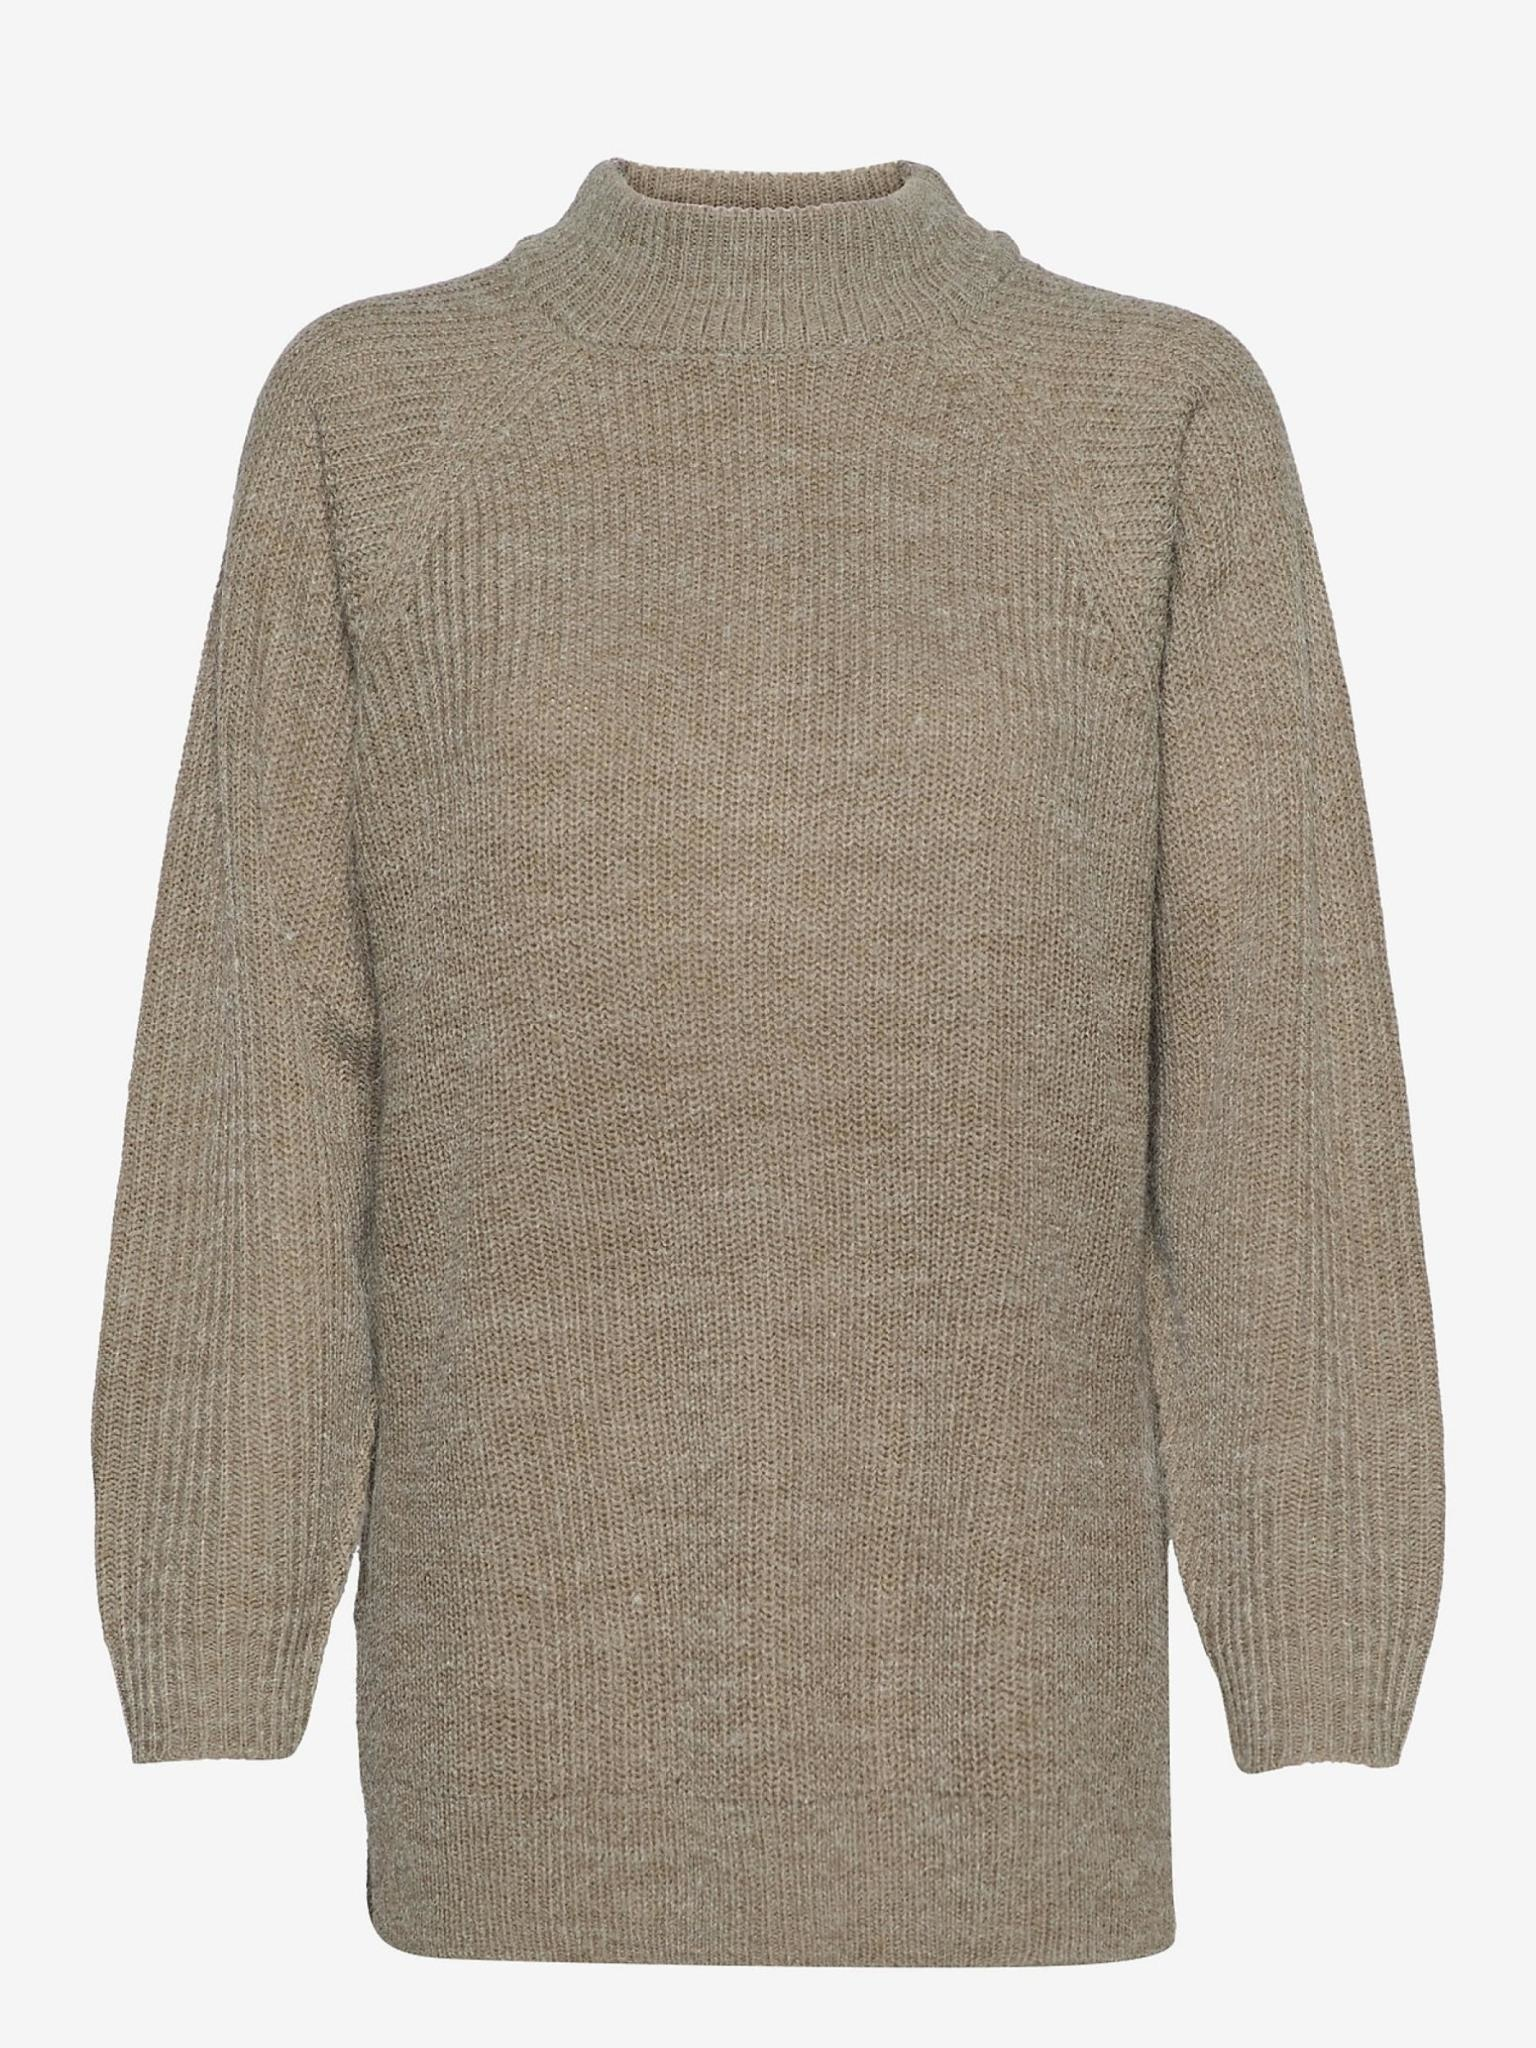 ICHI Marat Knit T Neck Pullover